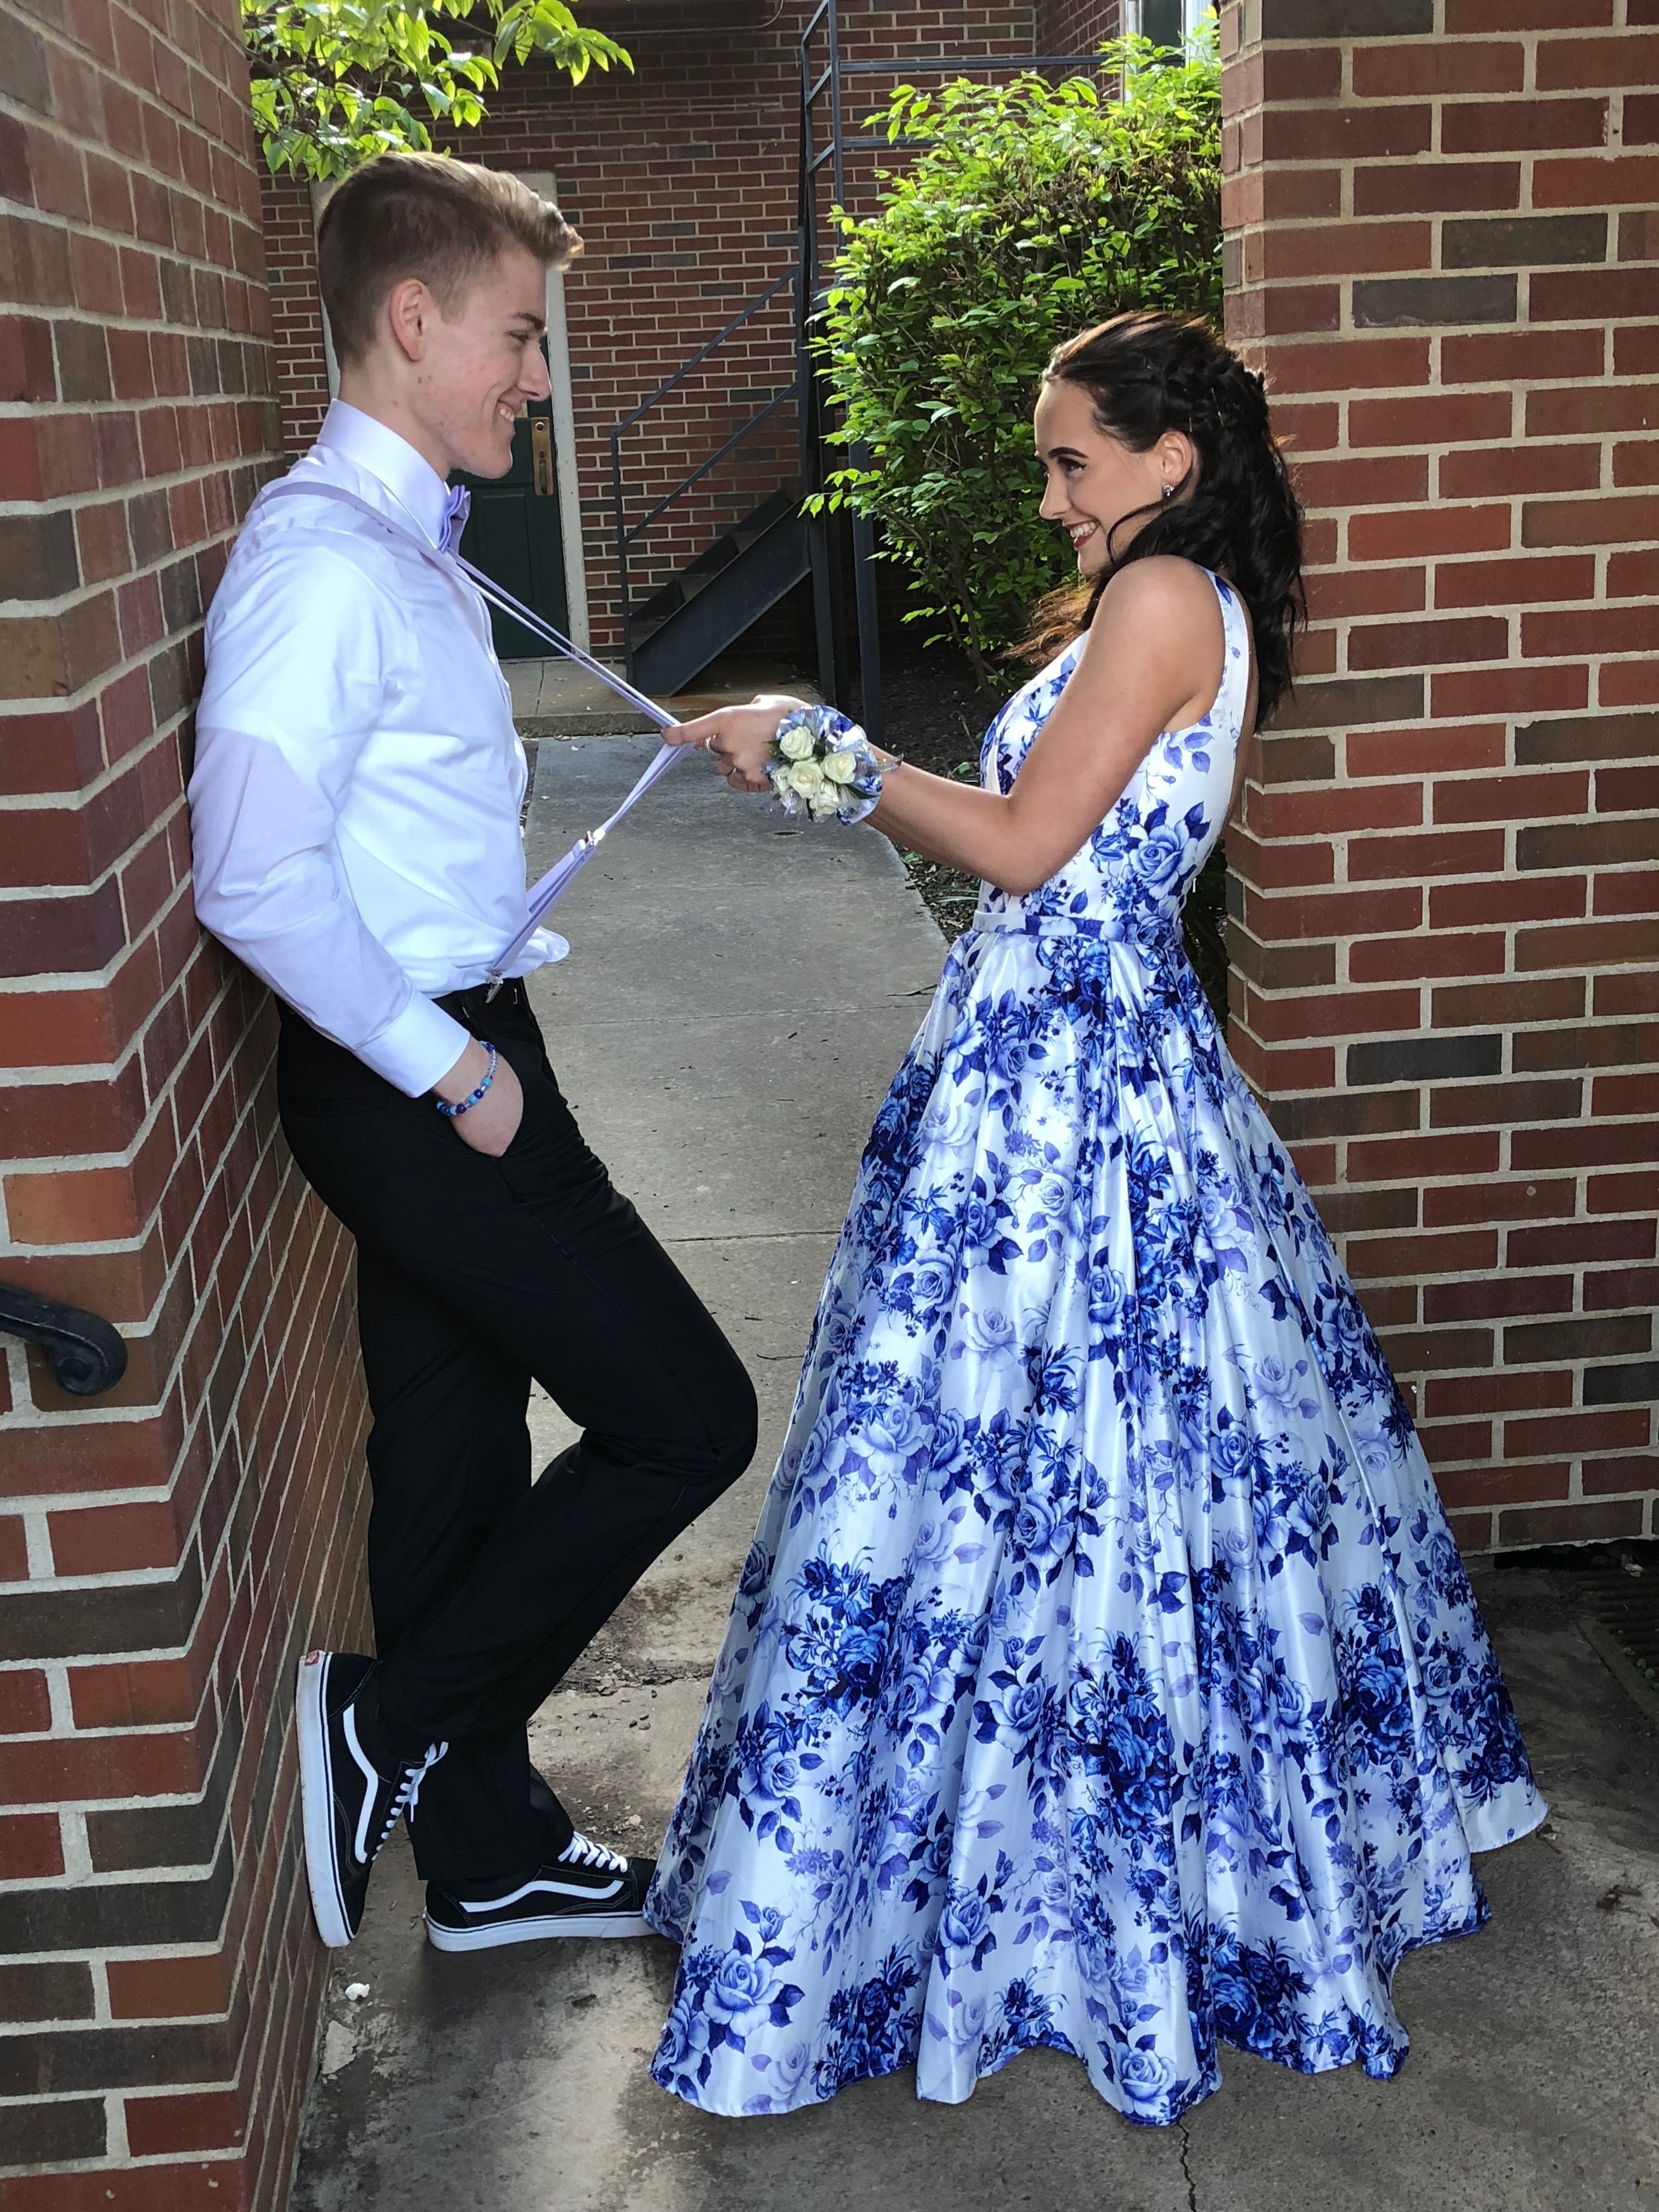 couple prom pics #prompictureposes